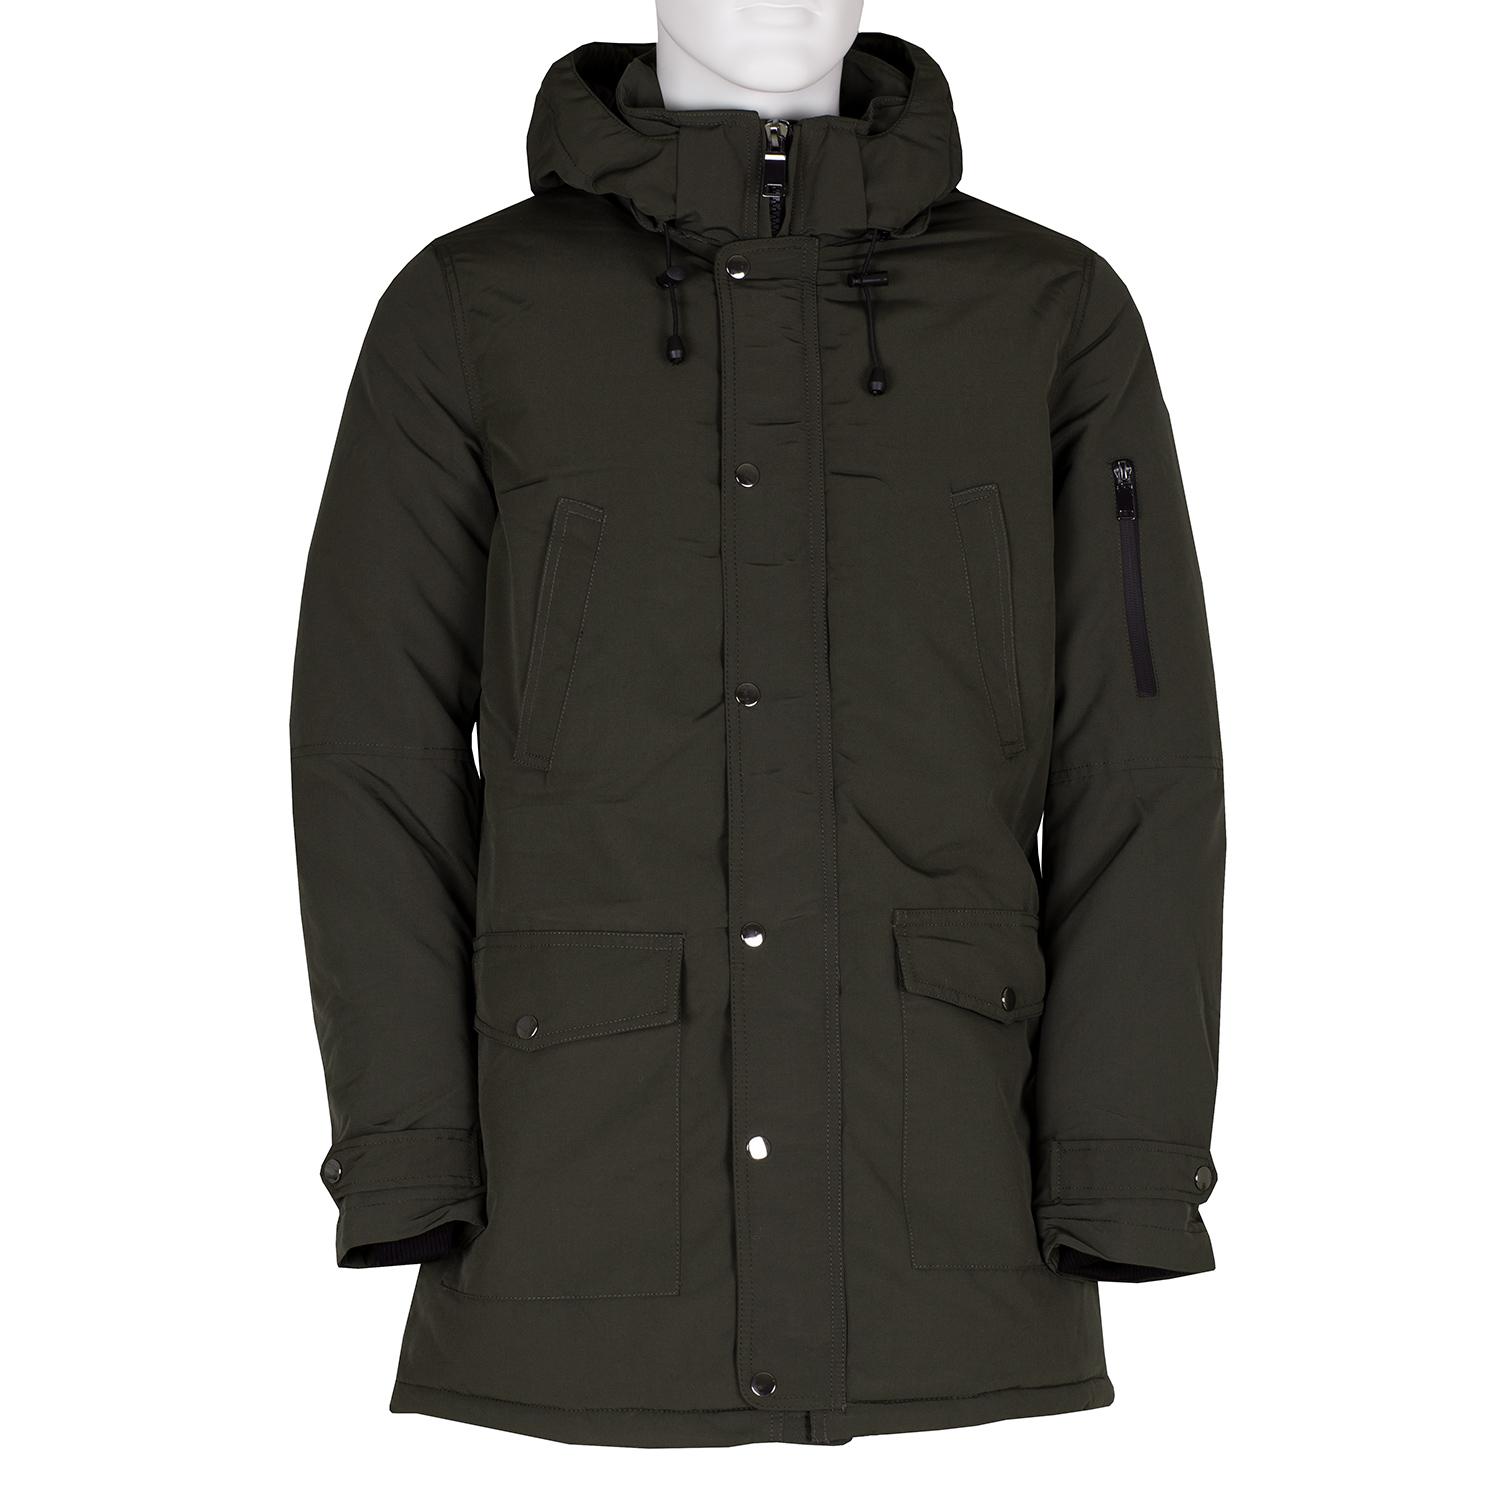 Pánska dlhá khaki bunda s kapucňou